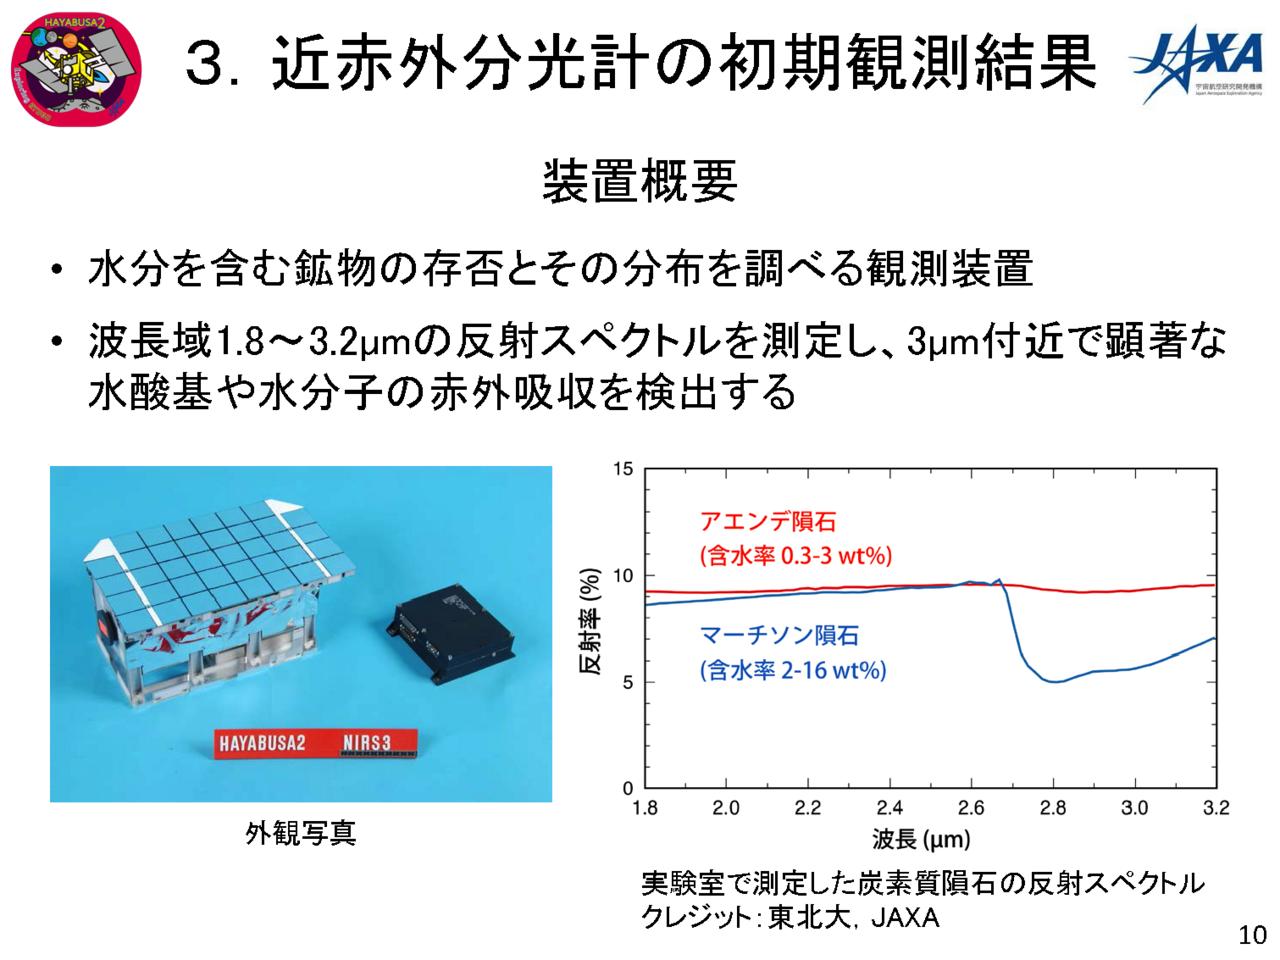 f:id:Imamura:20180802145930p:plain